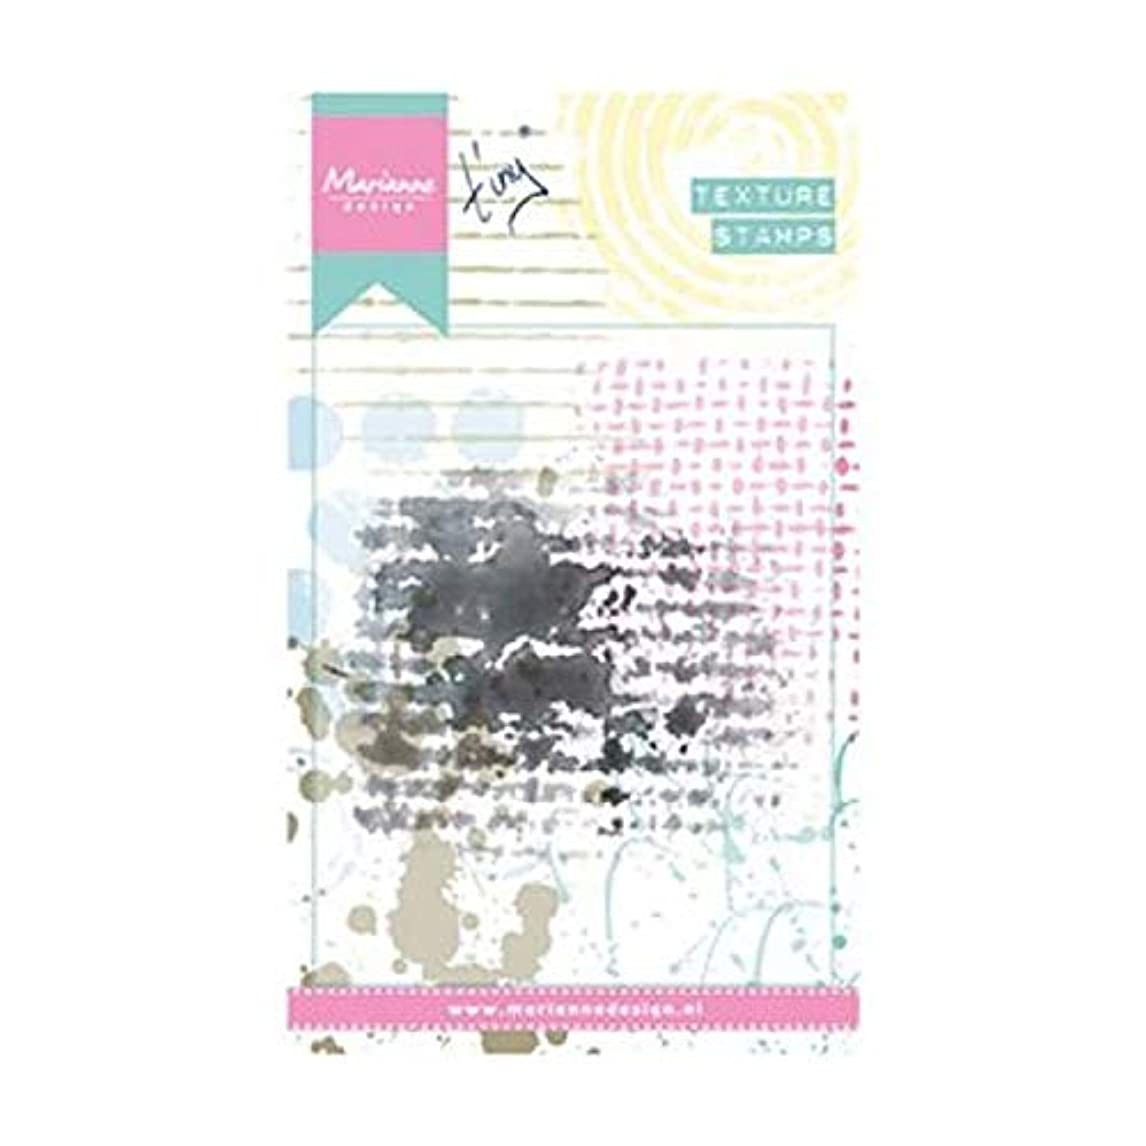 Marianne Design MM1616 Stamp Clear otjvm14245060856